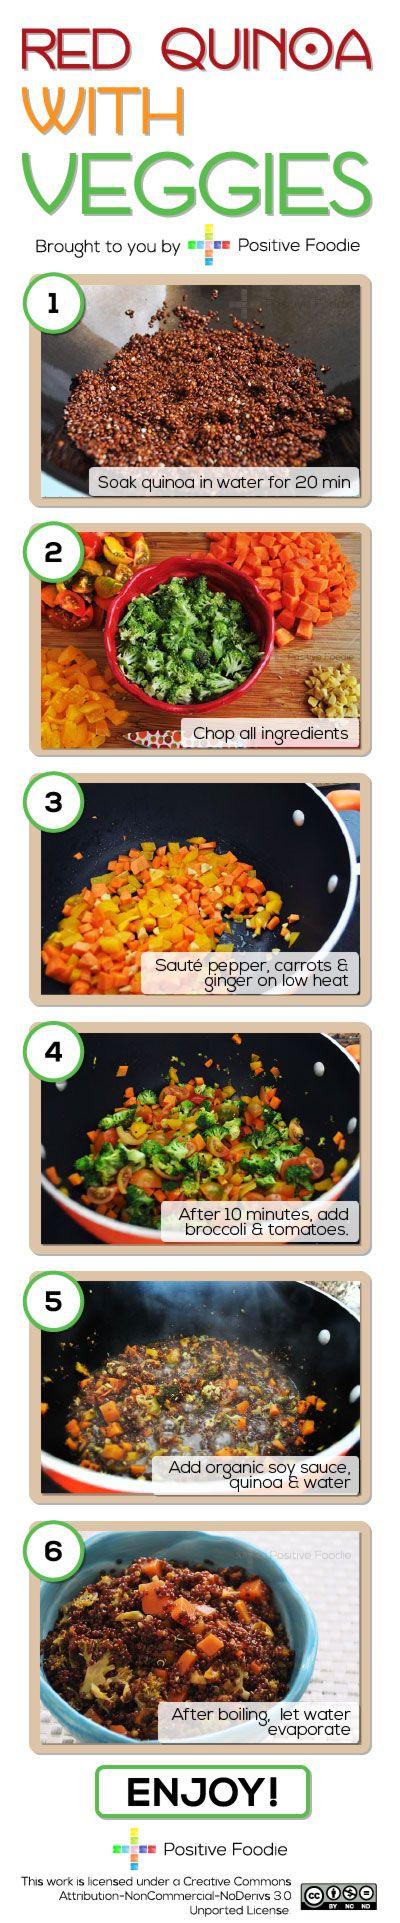 Red Quinoa with Veggies